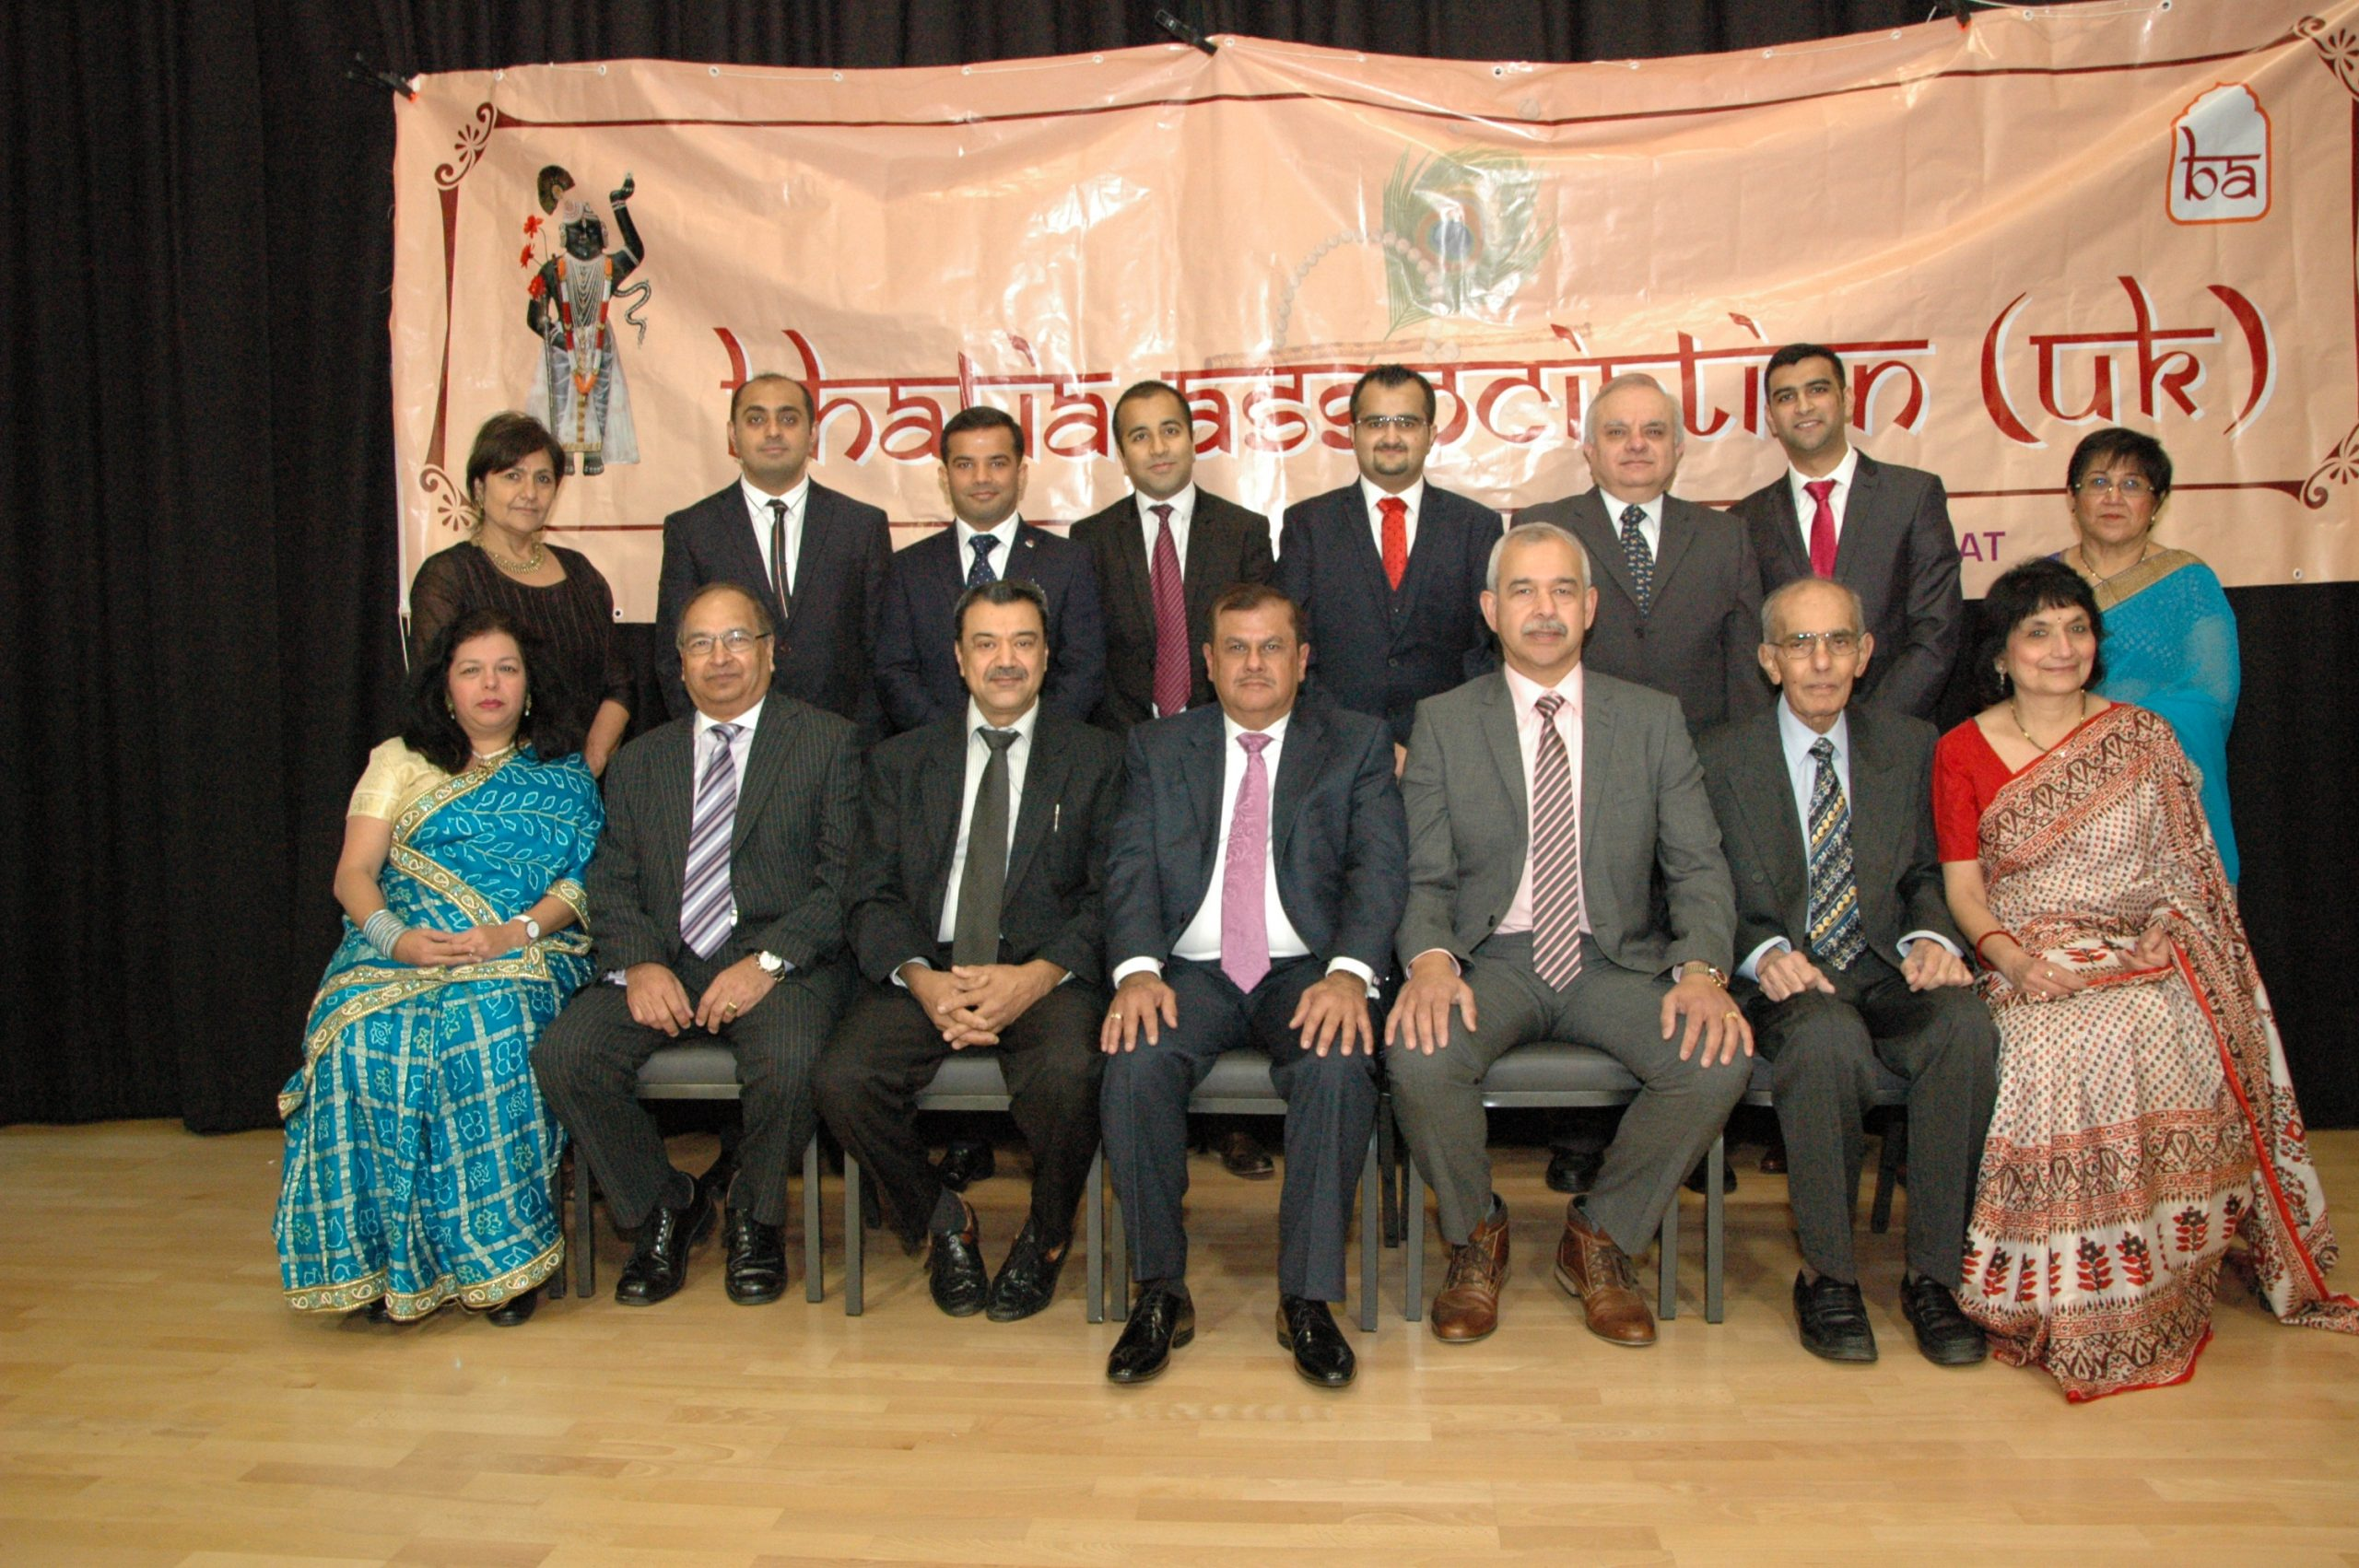 Bhatia Committee 2014-18